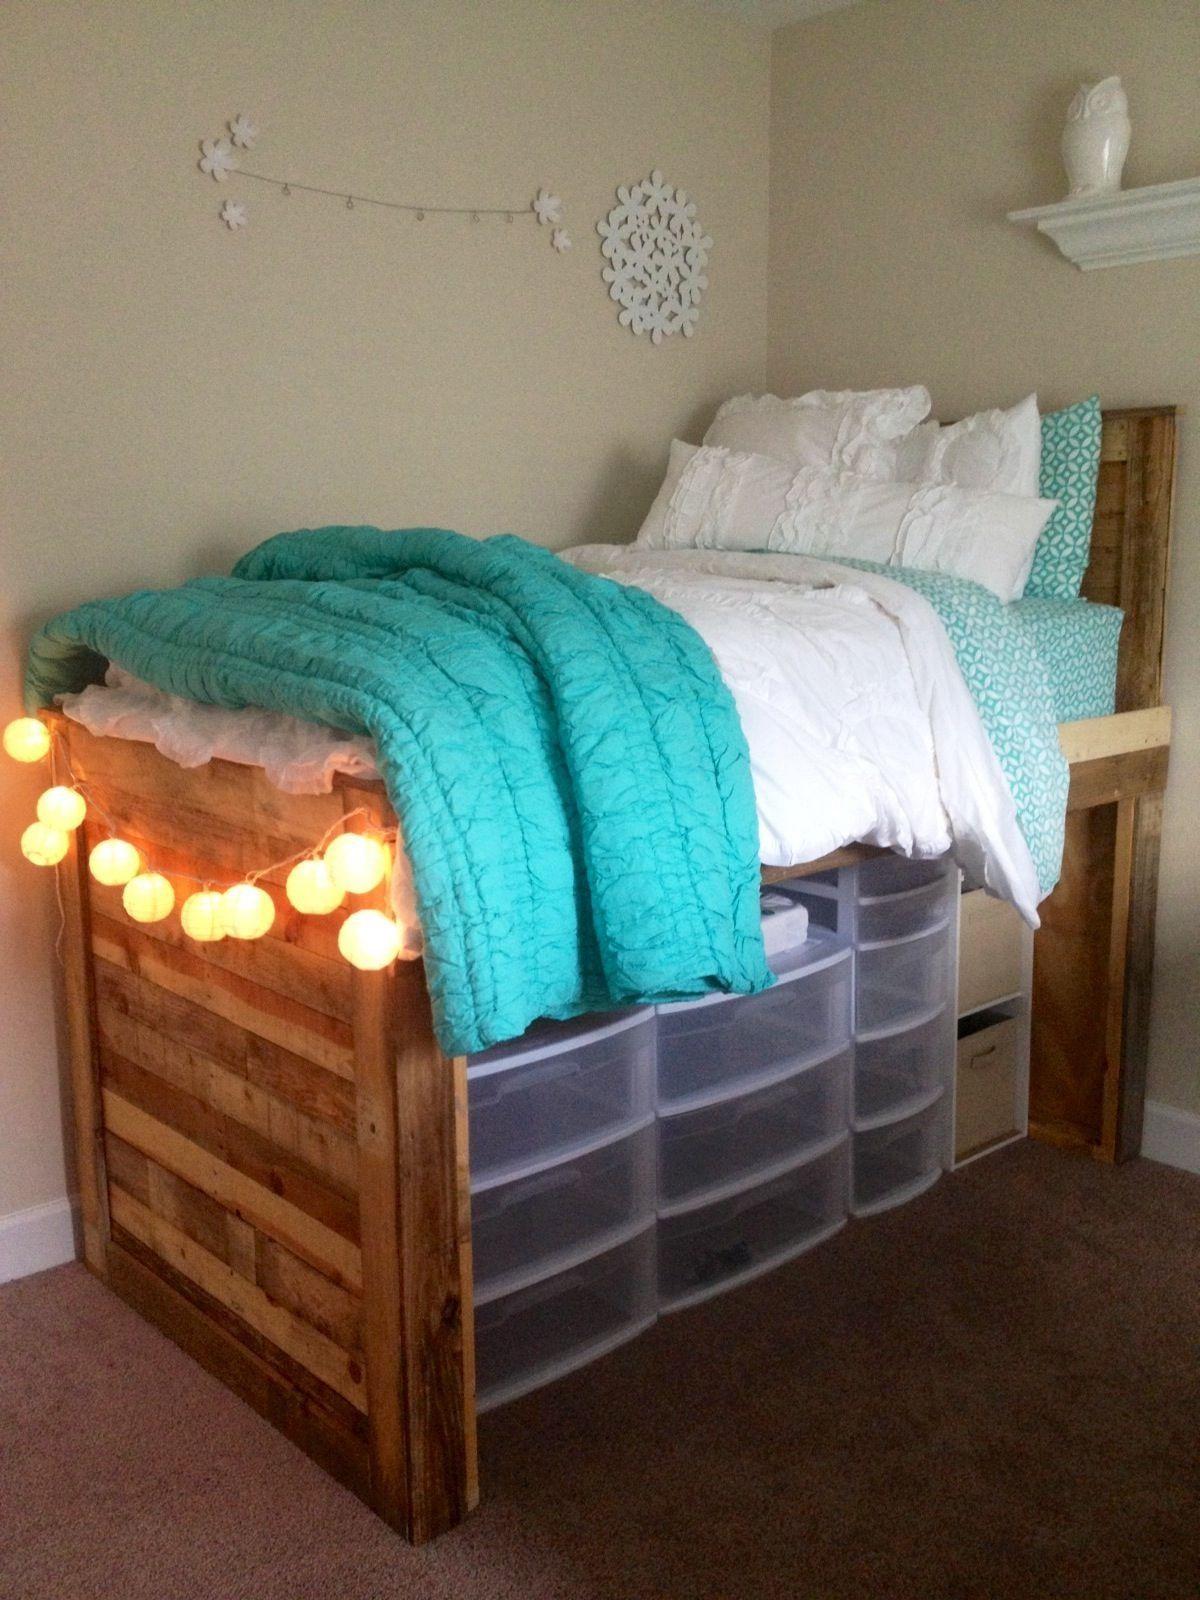 10 Easy Ways To Save Space In Your Dorm Room Dorm Room Diy Dorm